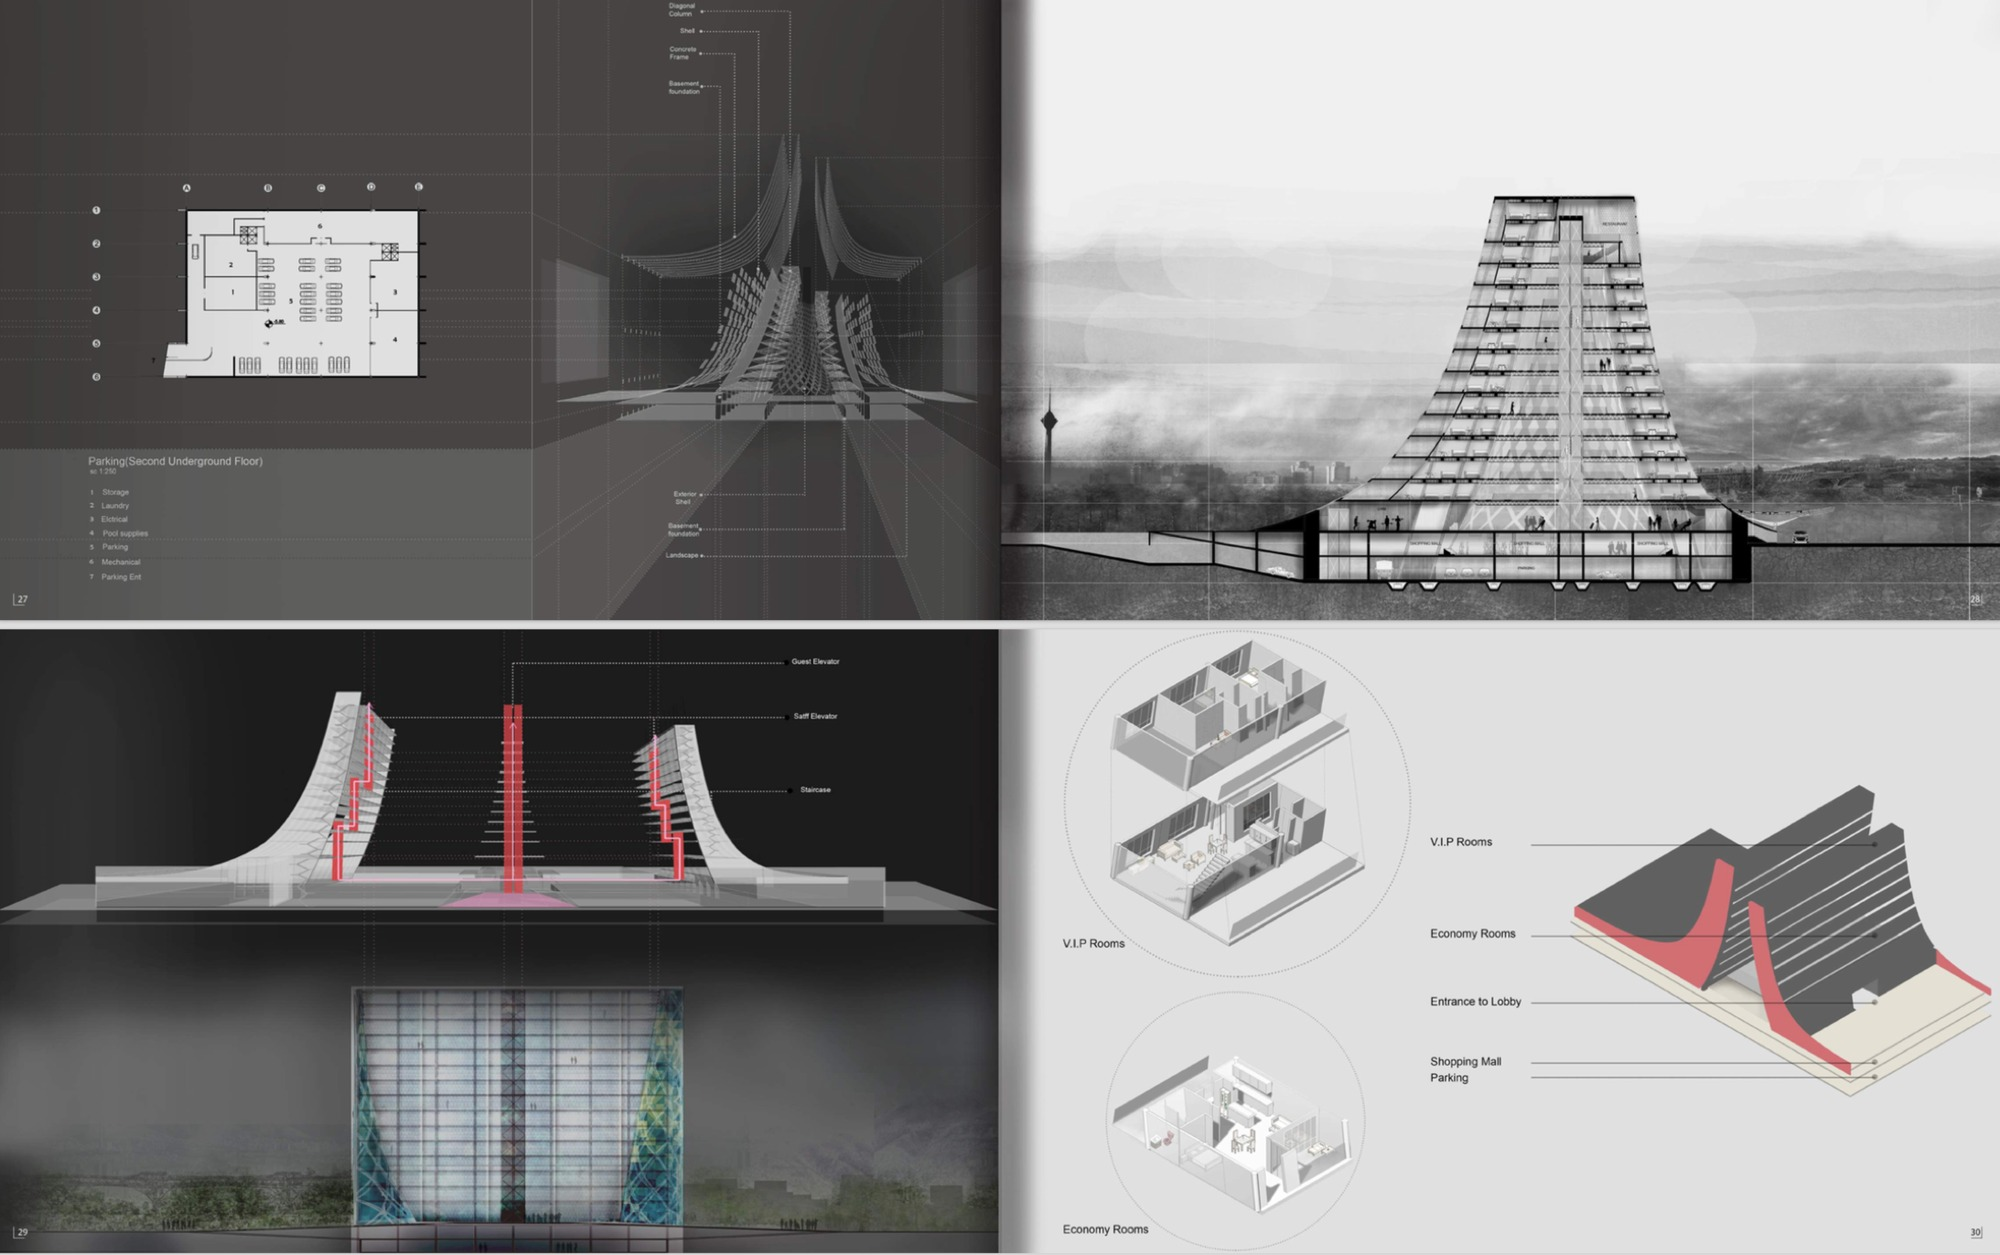 portfolio design layout ideas